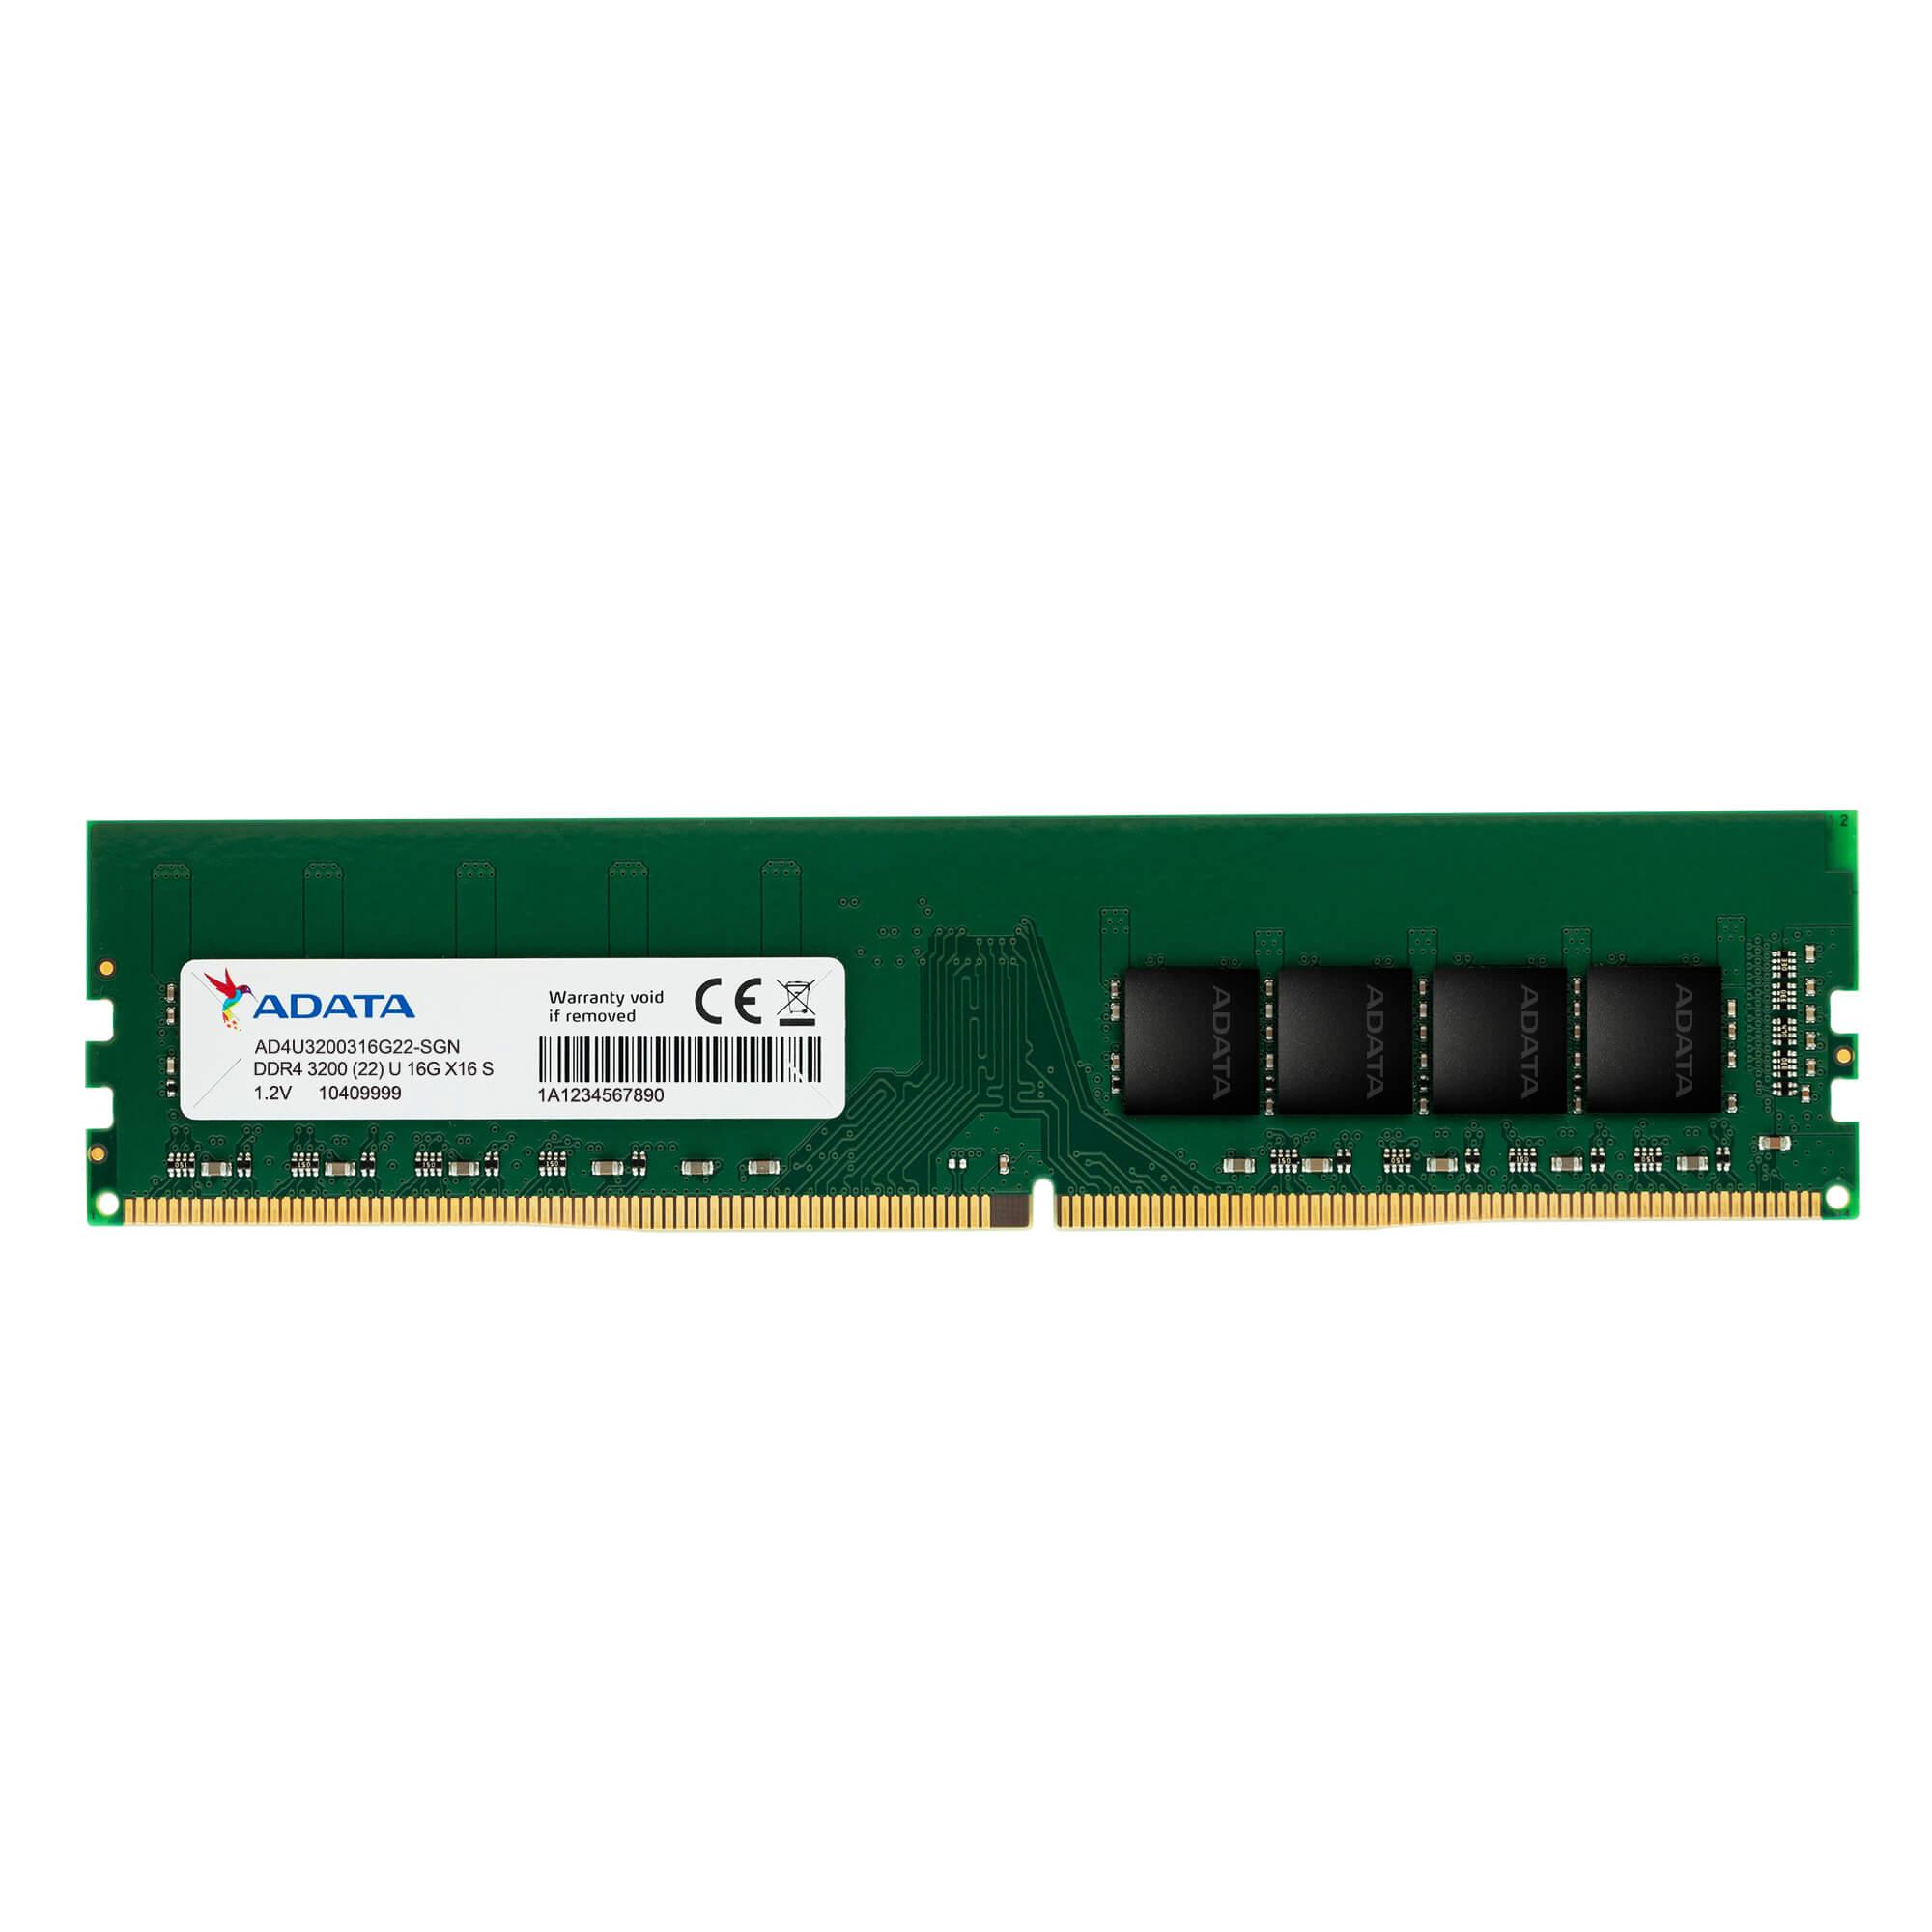 Memoria Adata para PC, 8GB, 3200MHz, DDR4 - AD4U320038G22-SGN